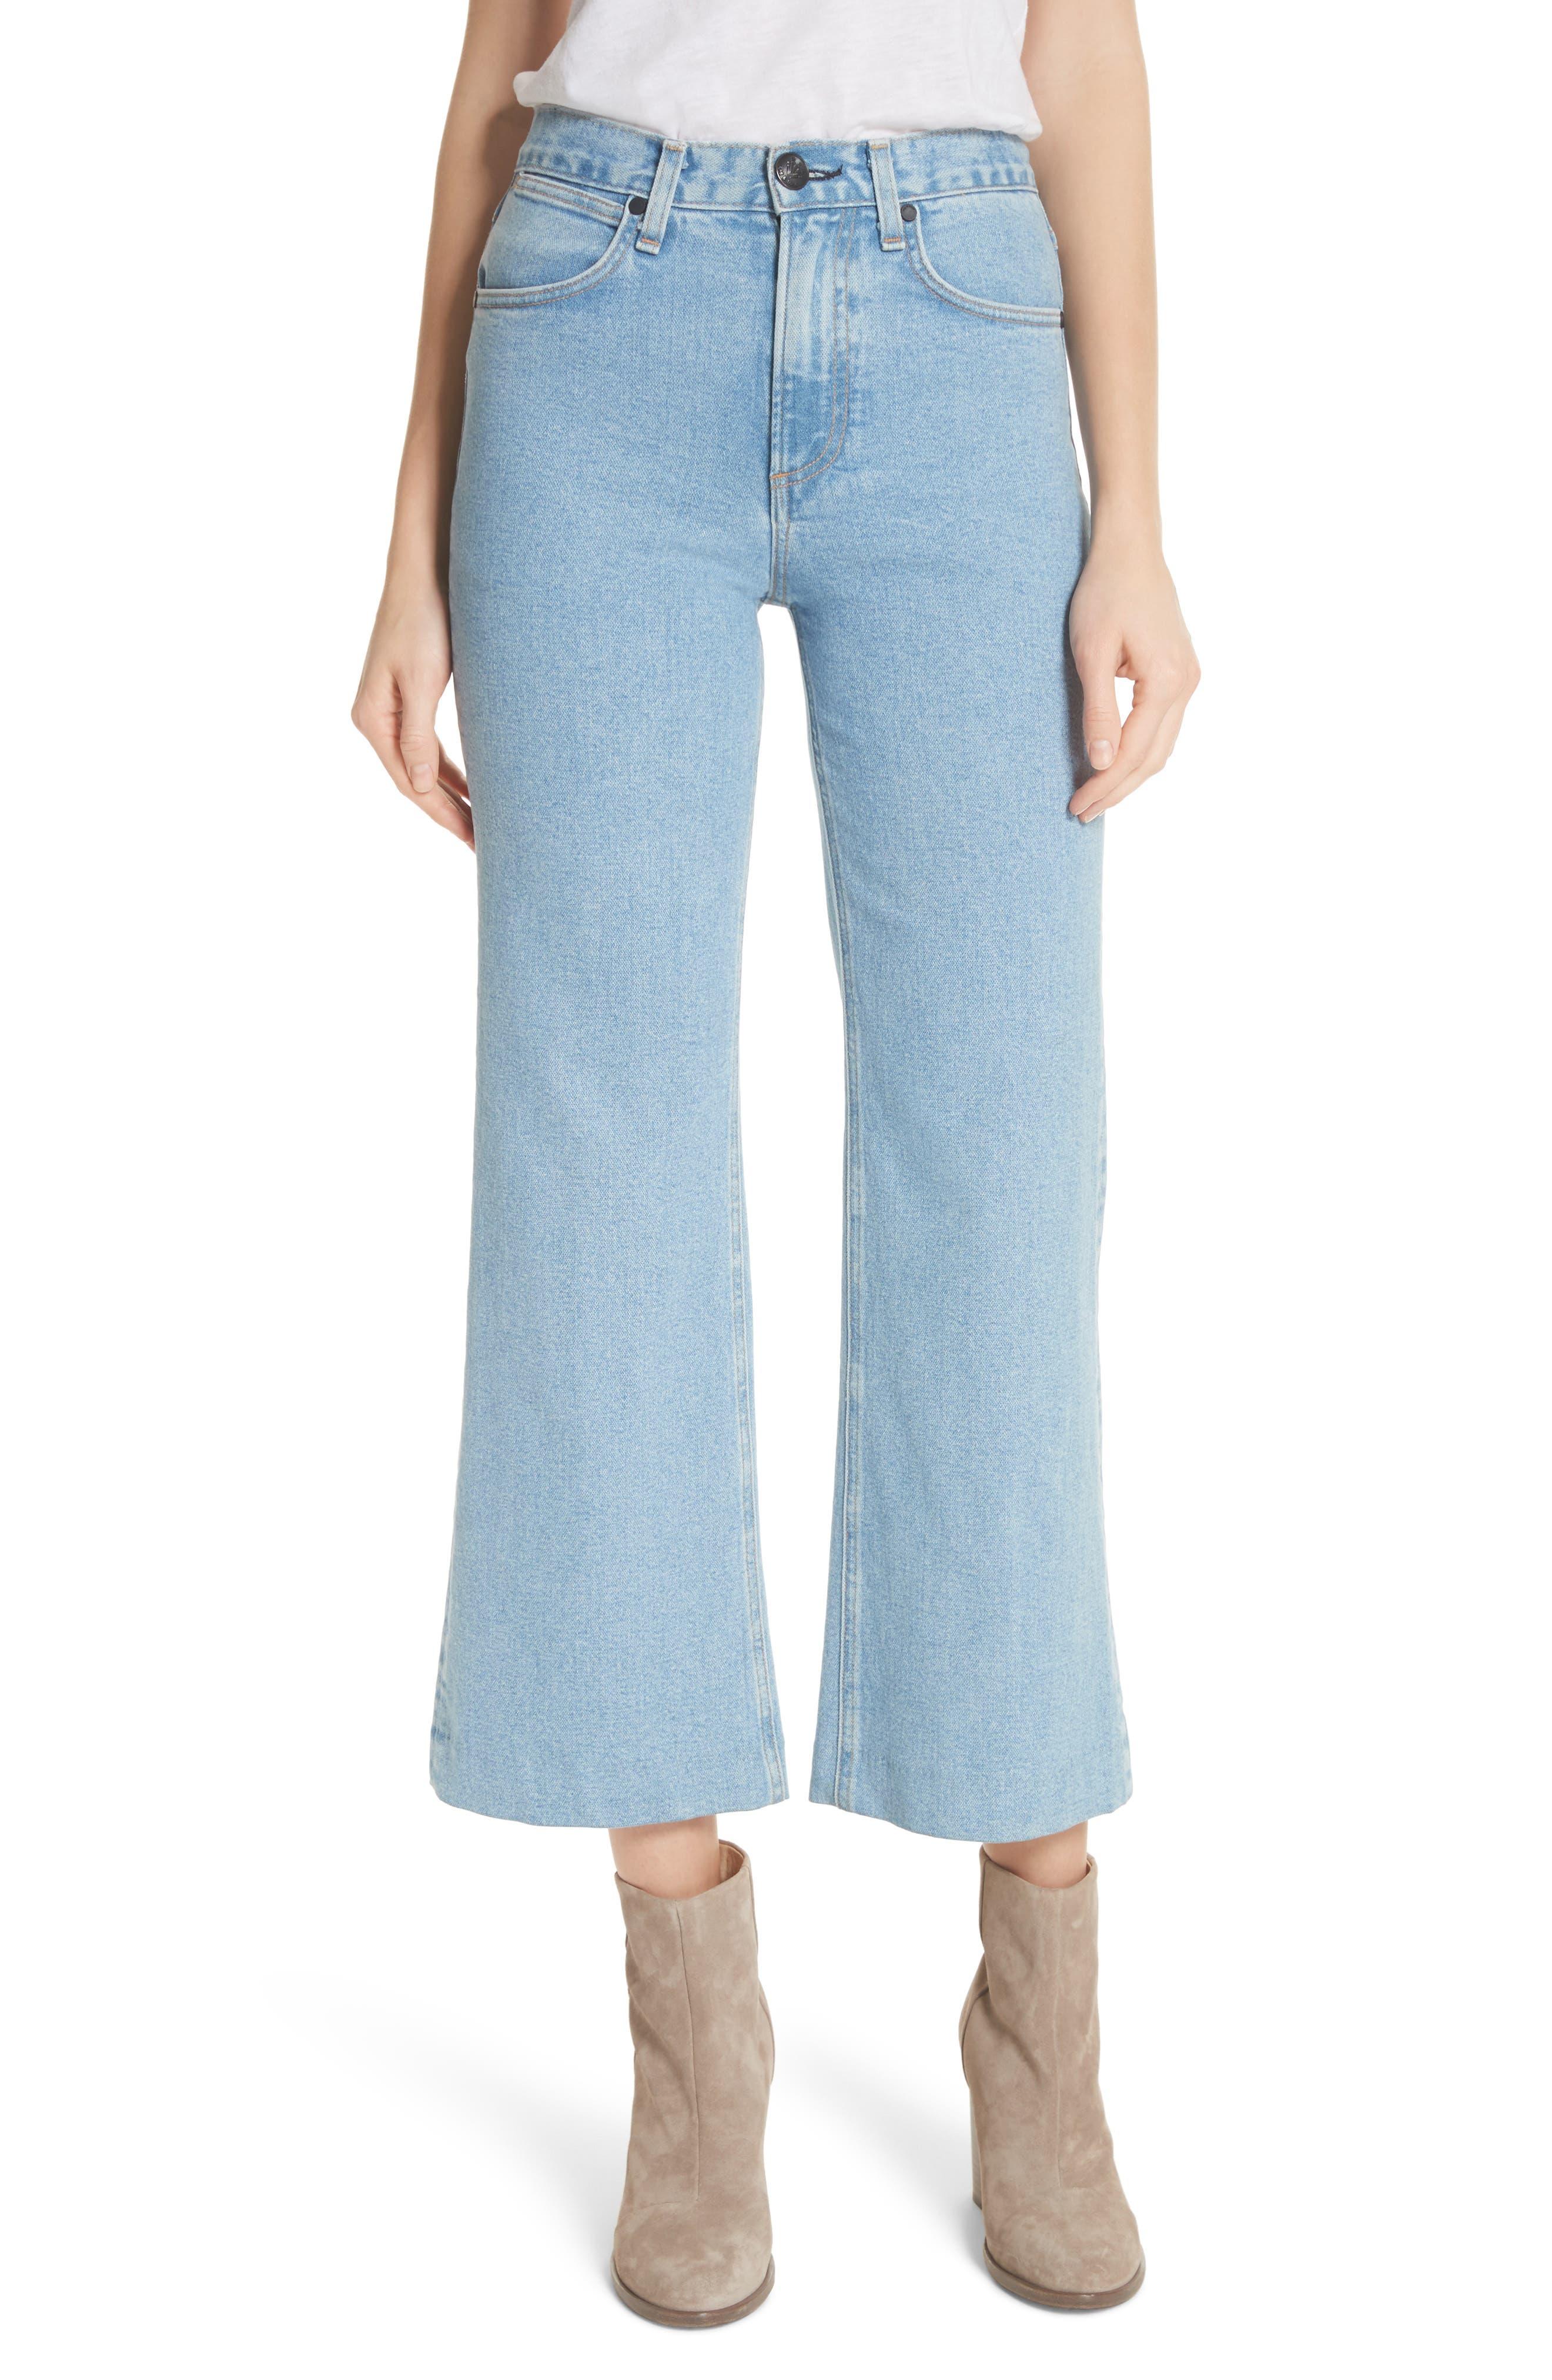 Justine High Waist Wide Leg Trouser Jeans,                         Main,                         color, 450